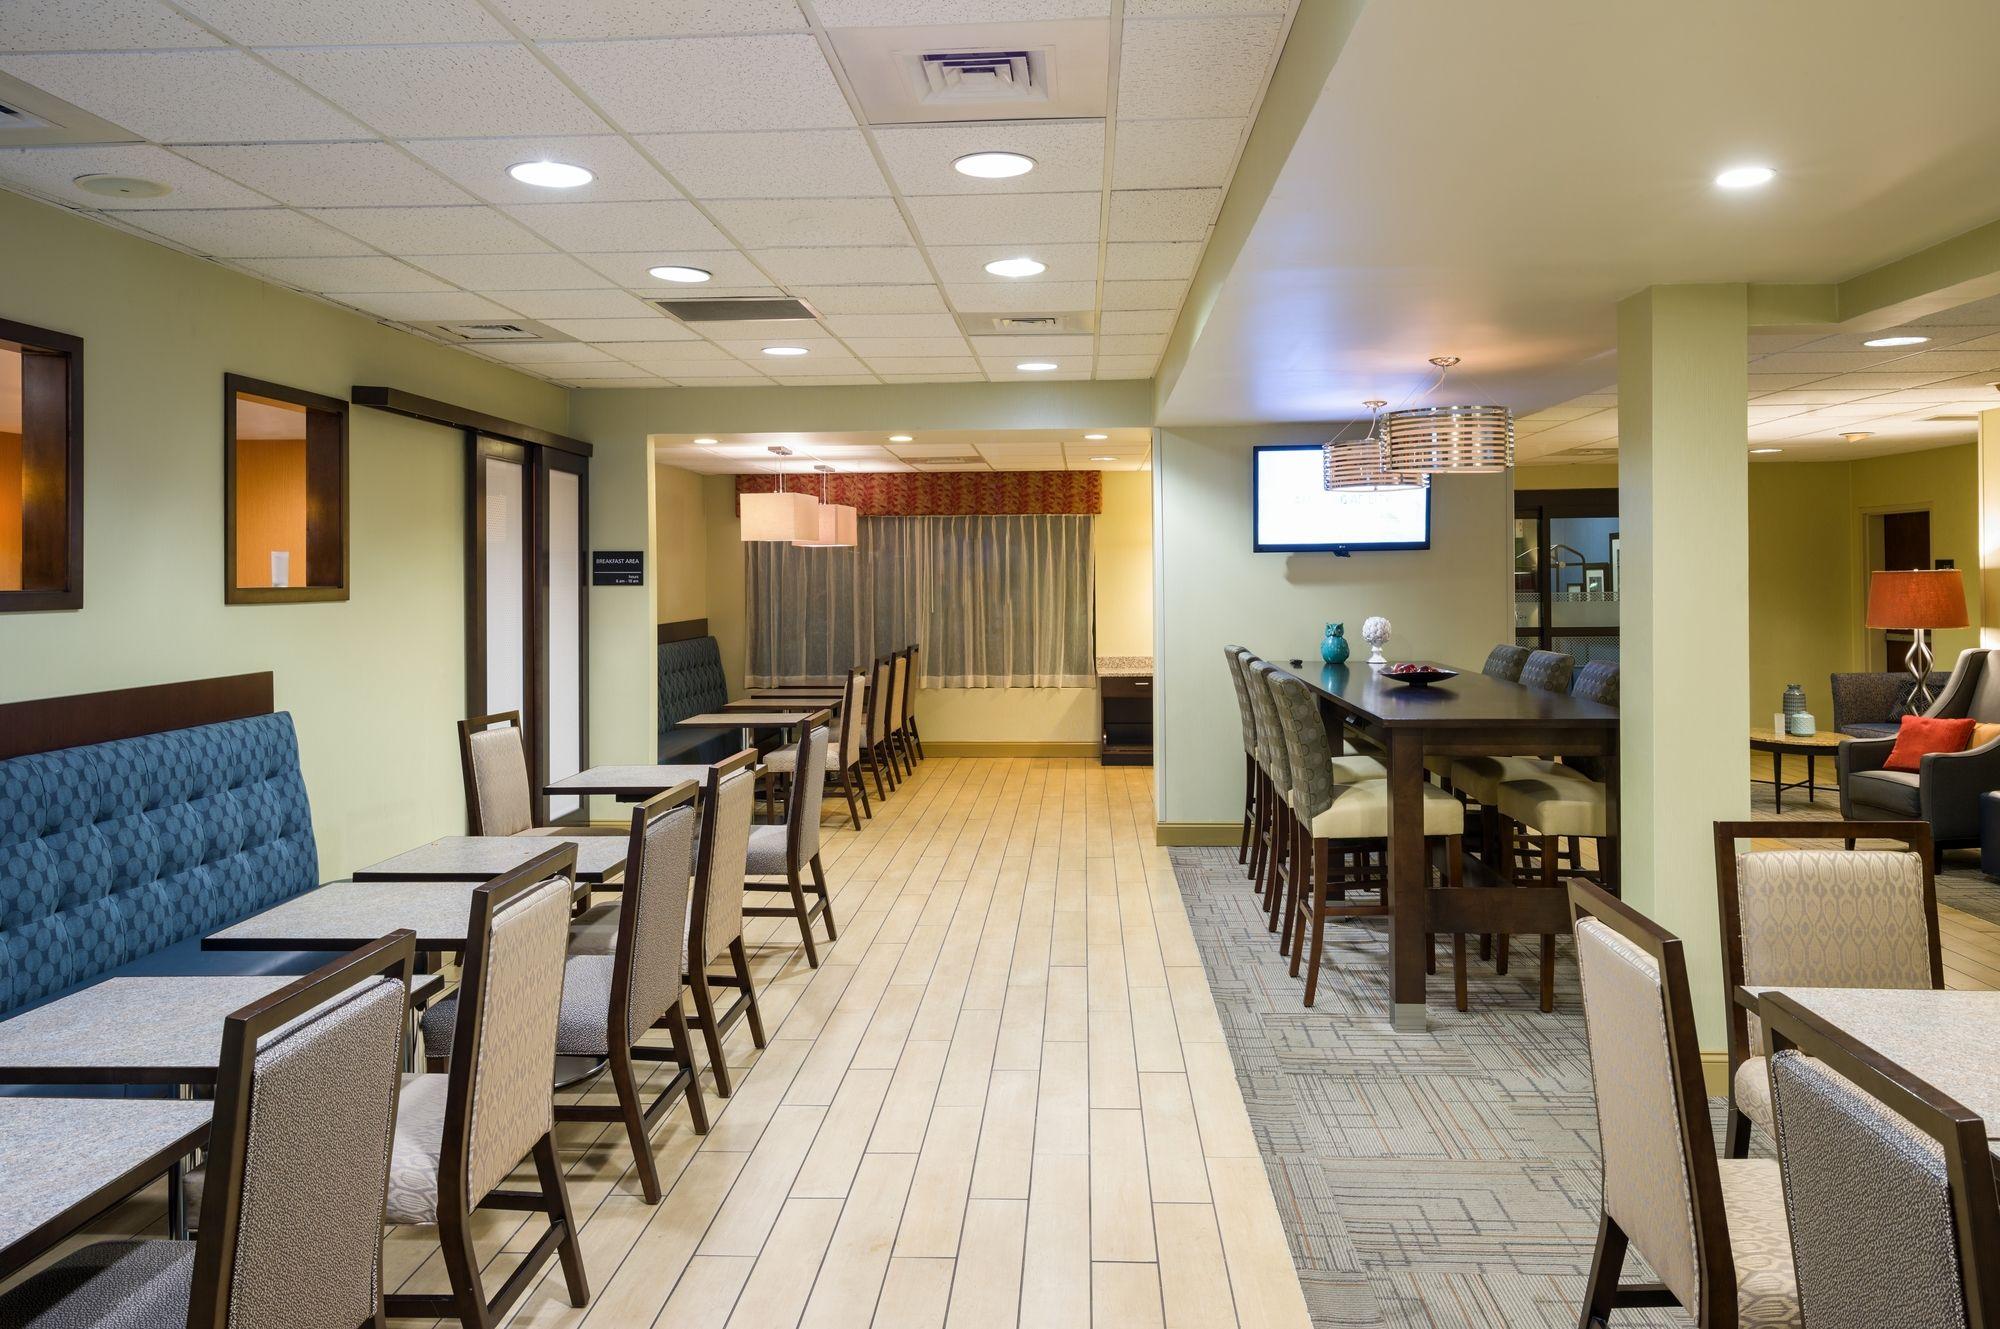 danville hotel coupons for danville pennsylvania. Black Bedroom Furniture Sets. Home Design Ideas